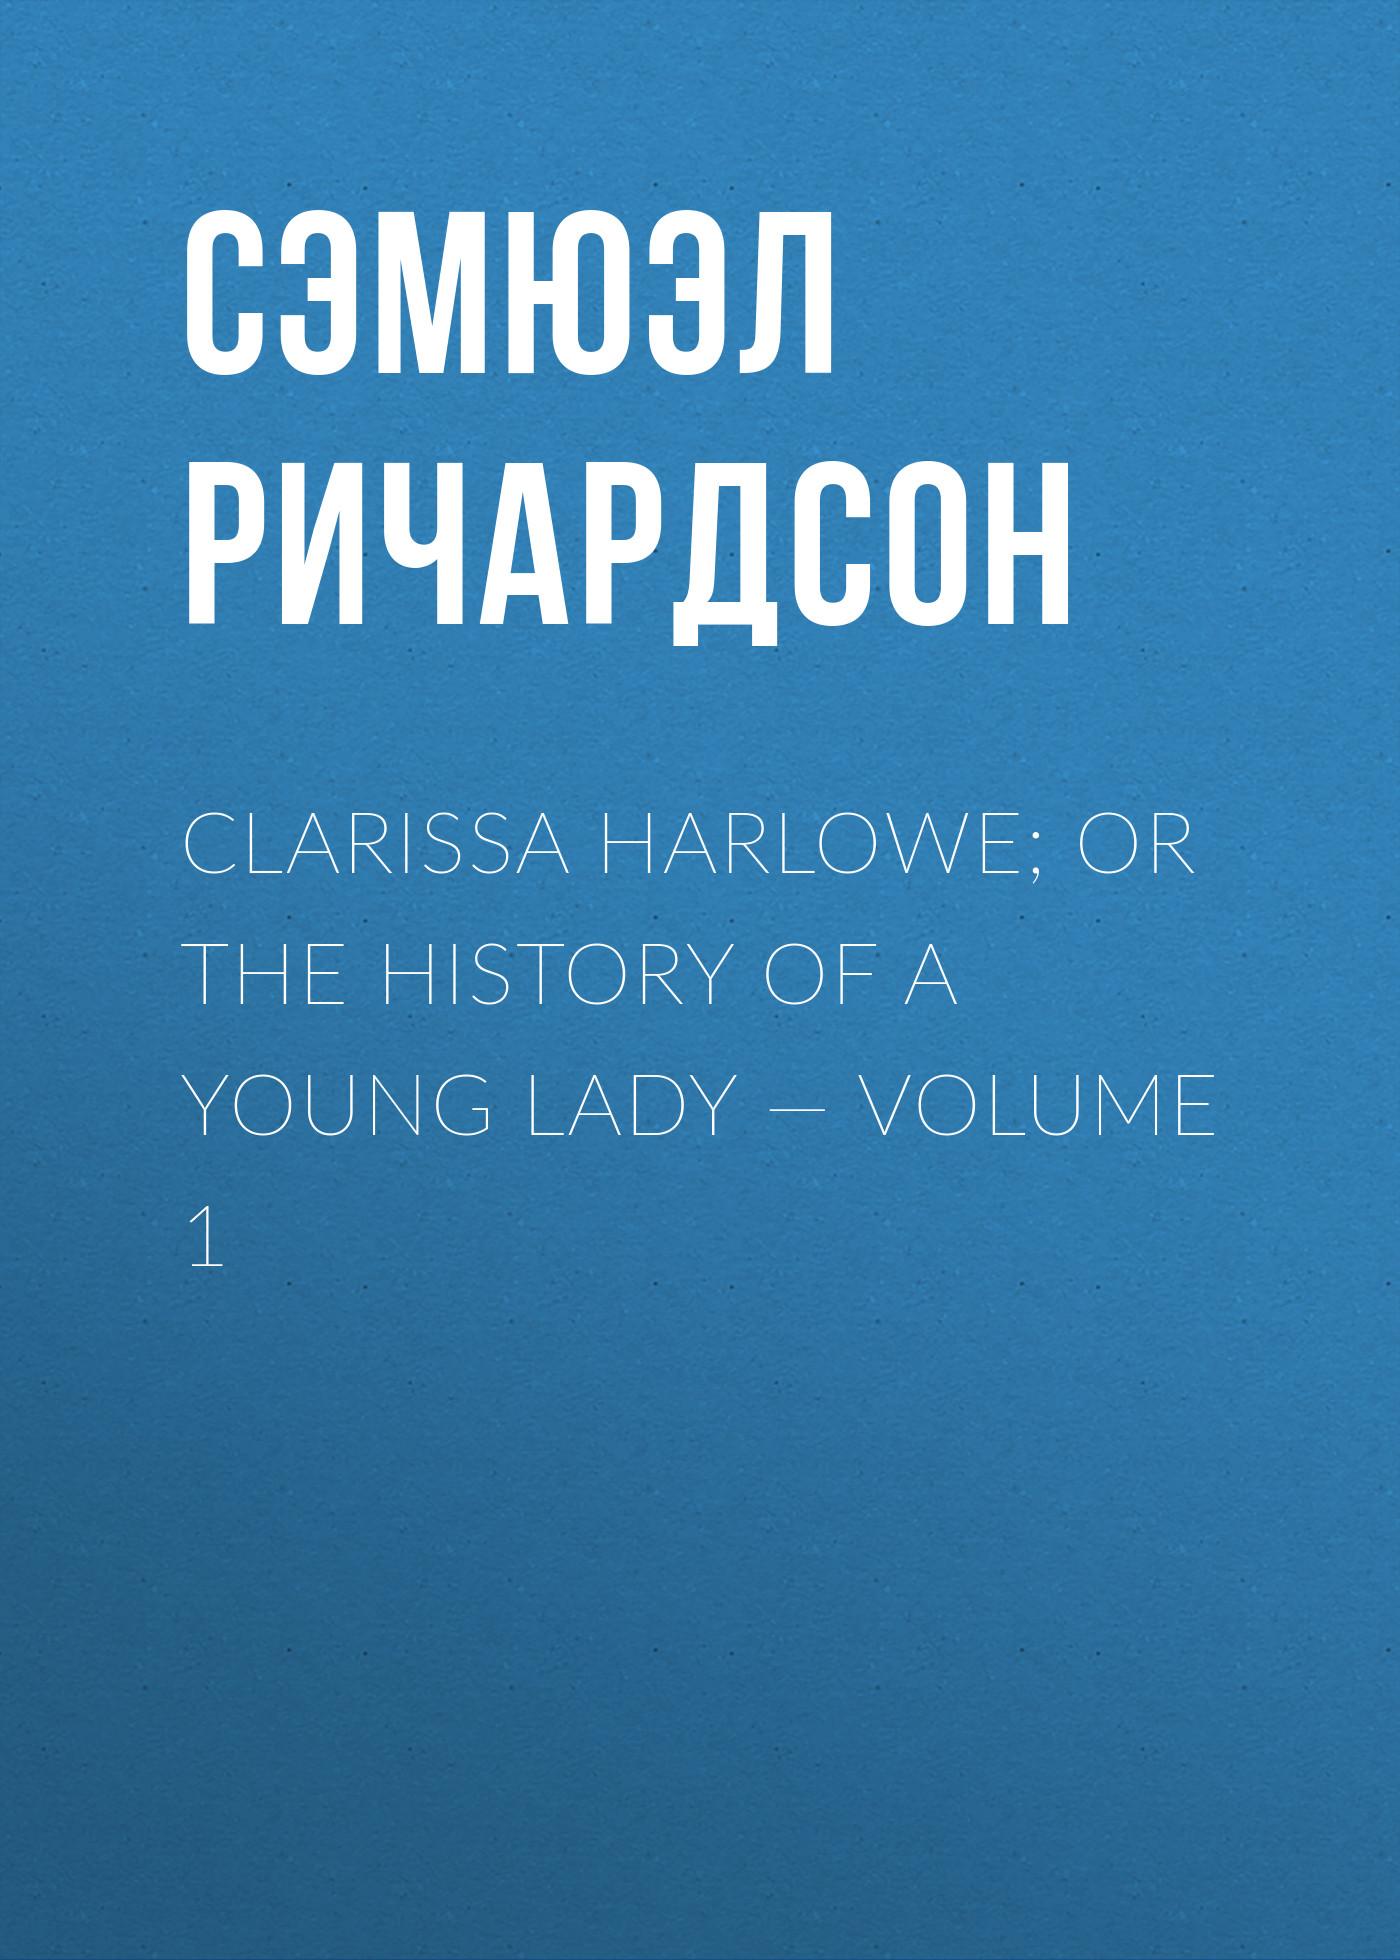 Сэмюэл Ричардсон Clarissa Harlowe; or the history of a young lady — Volume 1 сэмюэл ричардсон clarissa harlowe or the history of a young lady volume 2